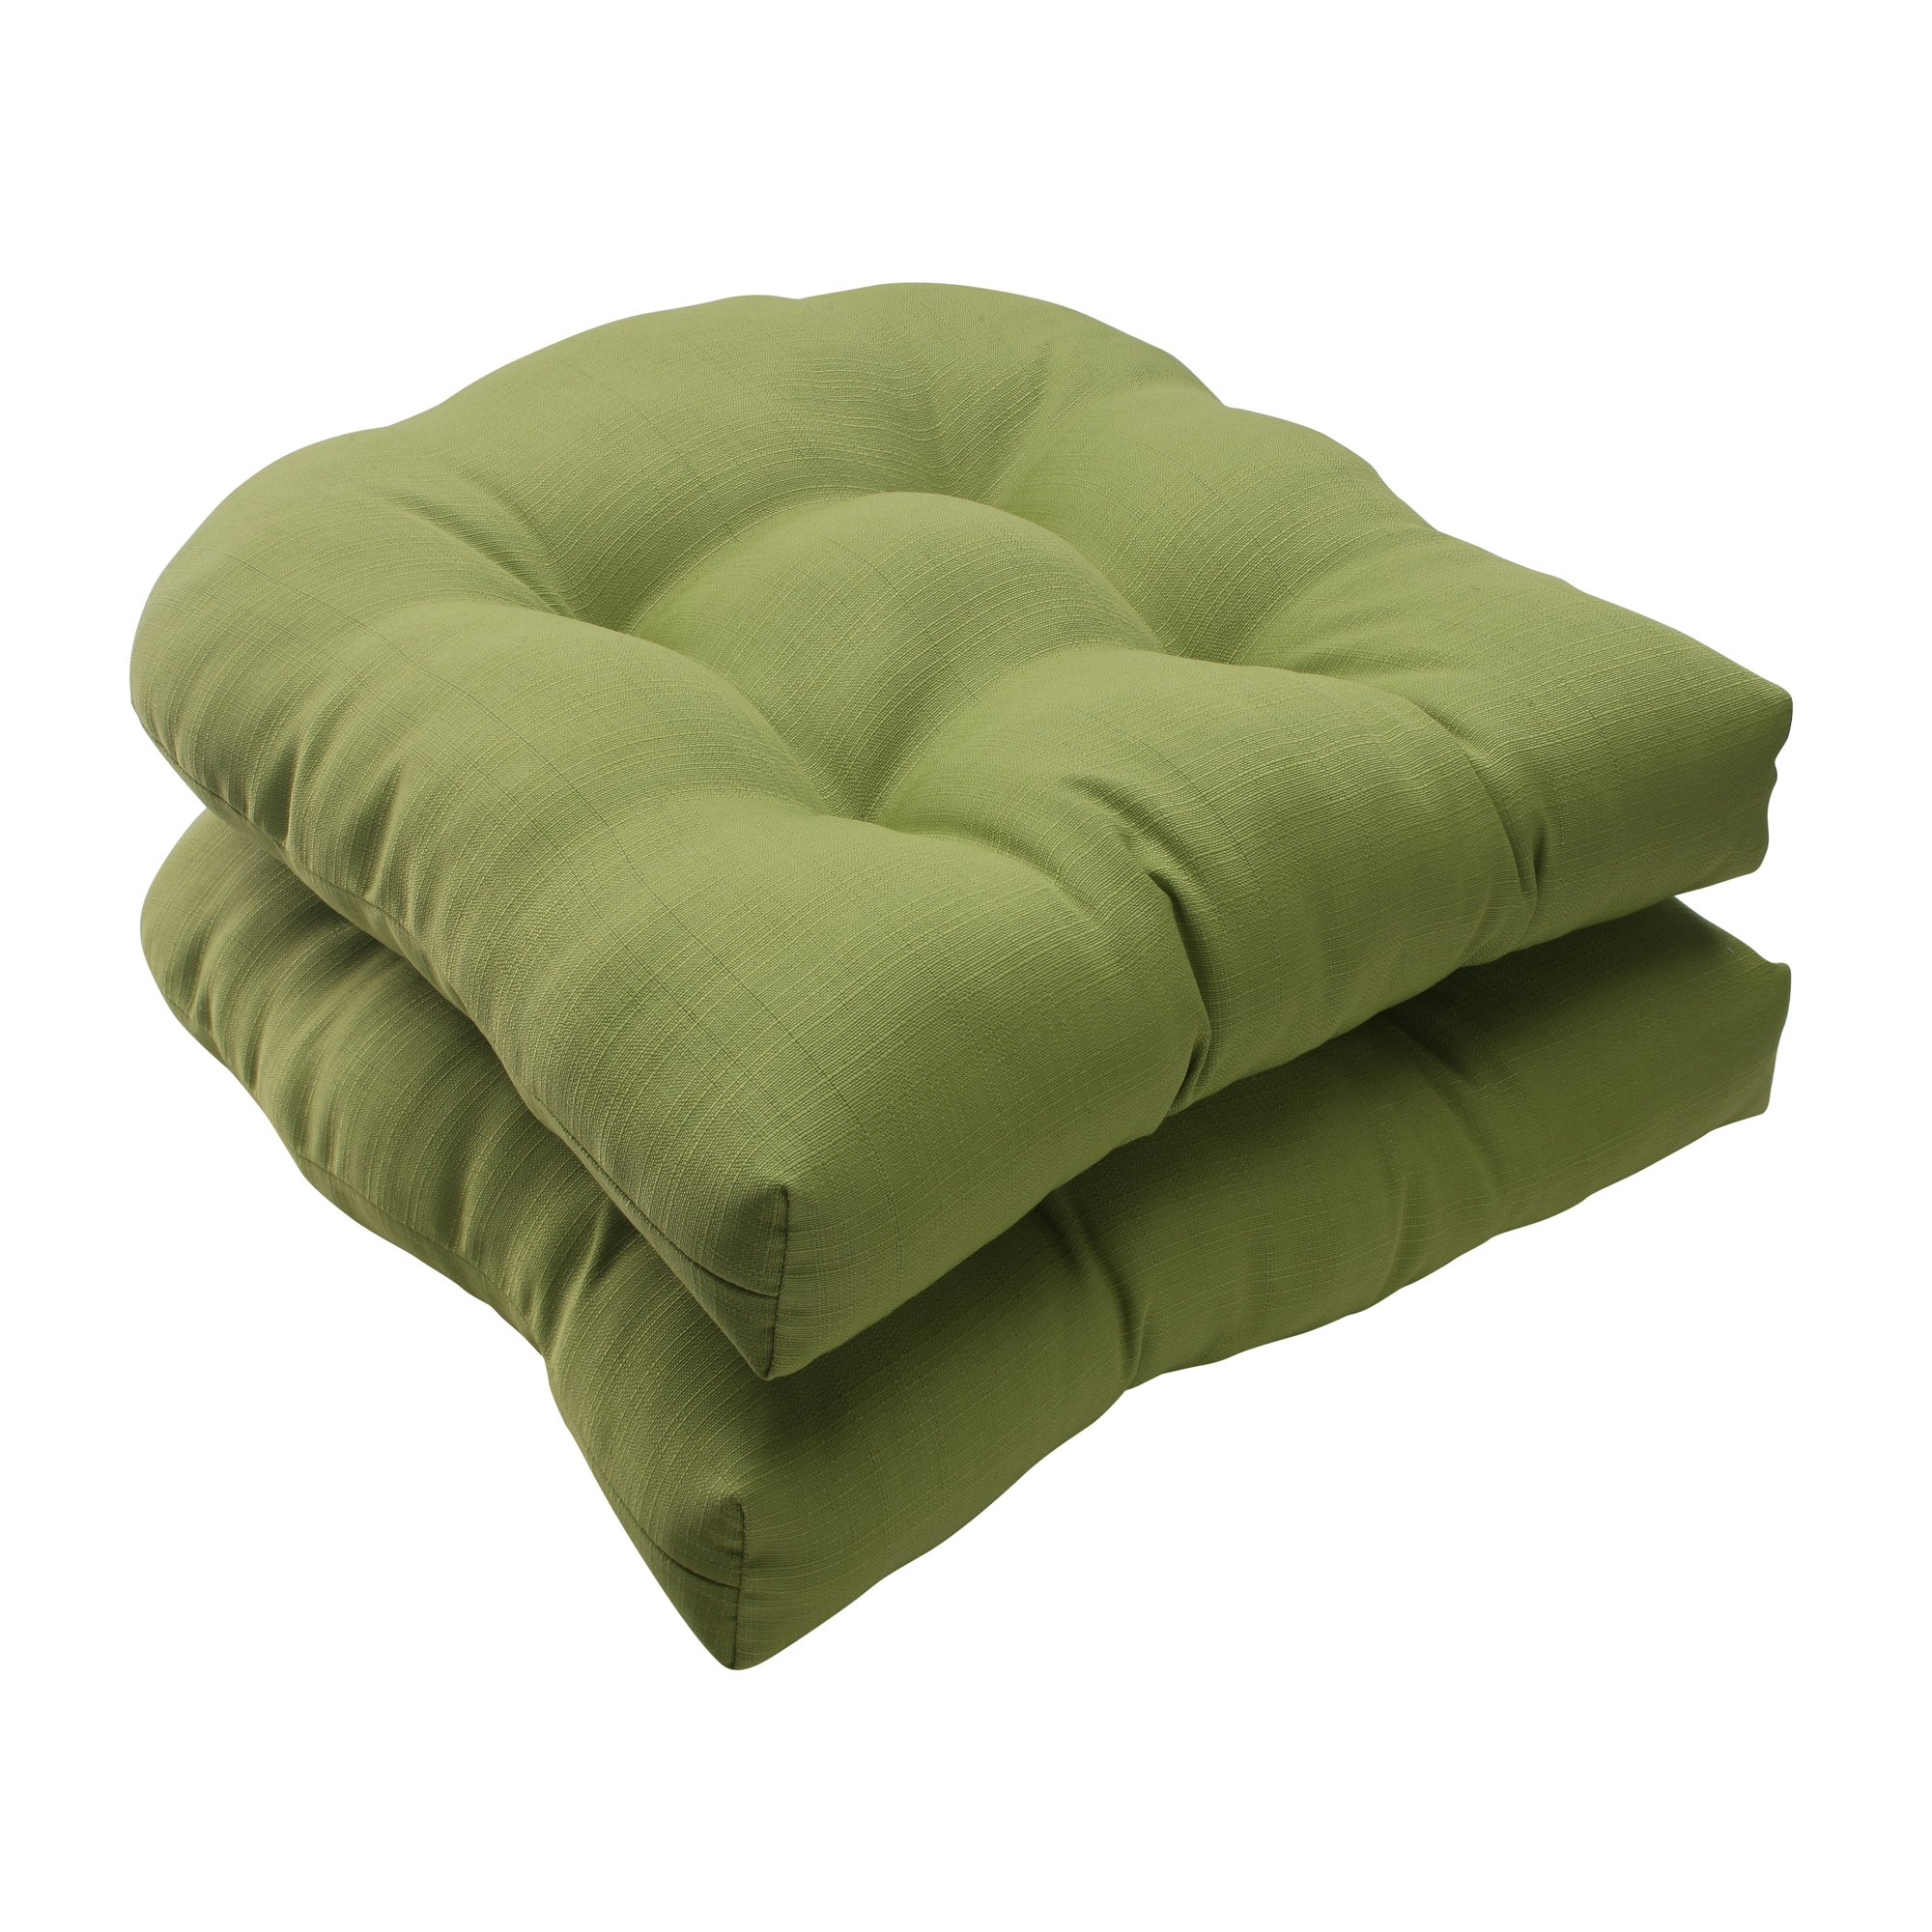 Pillow Perfect Indoor/Outdoor Forsyth Green Wicker